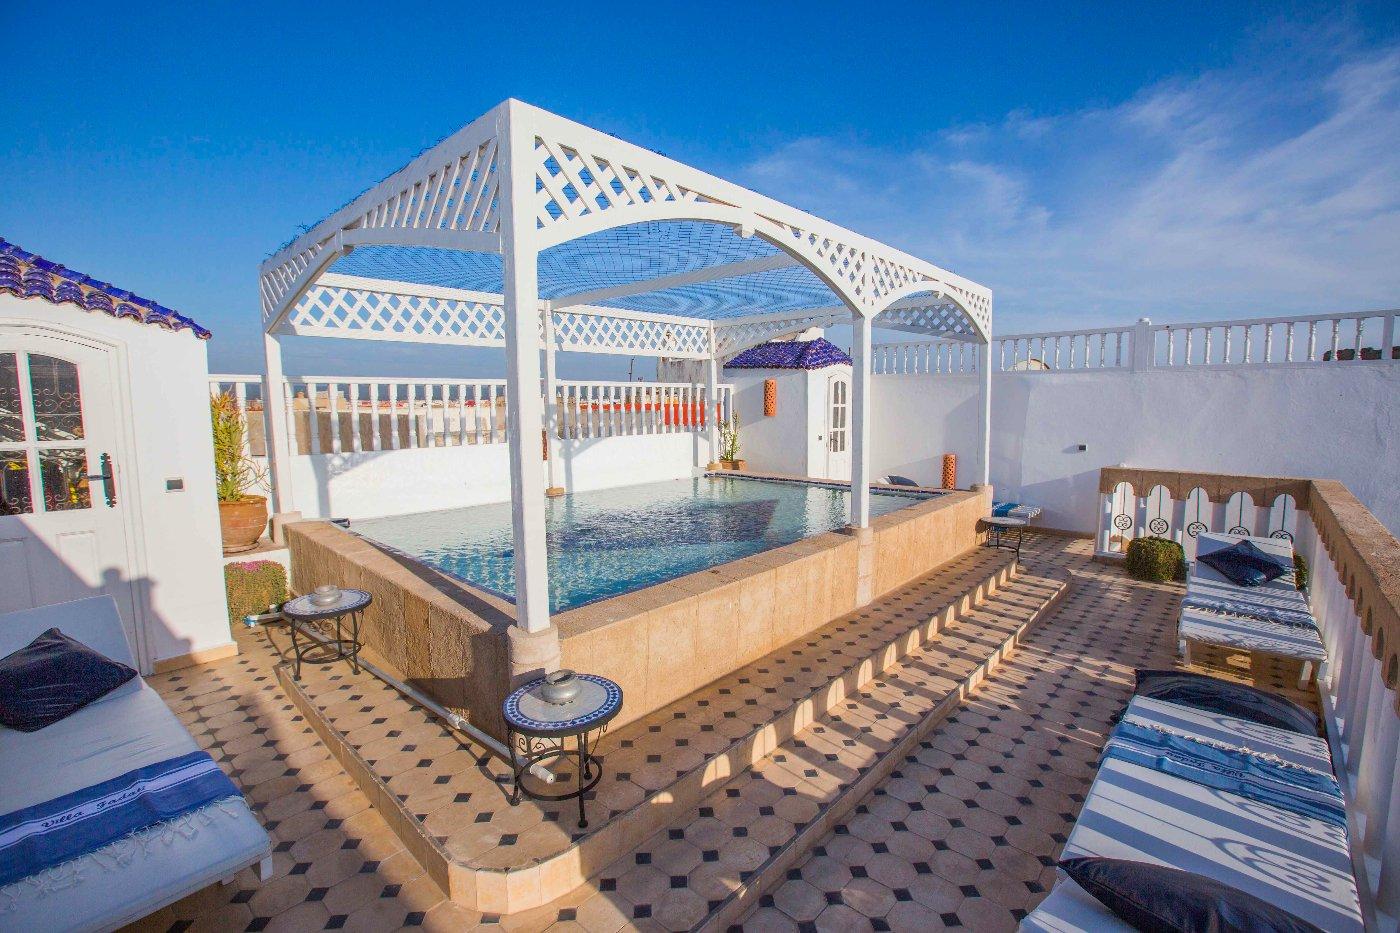 Riad en location avec piscine karimo immobilier essaouira - Location villa piscine essaouira ...